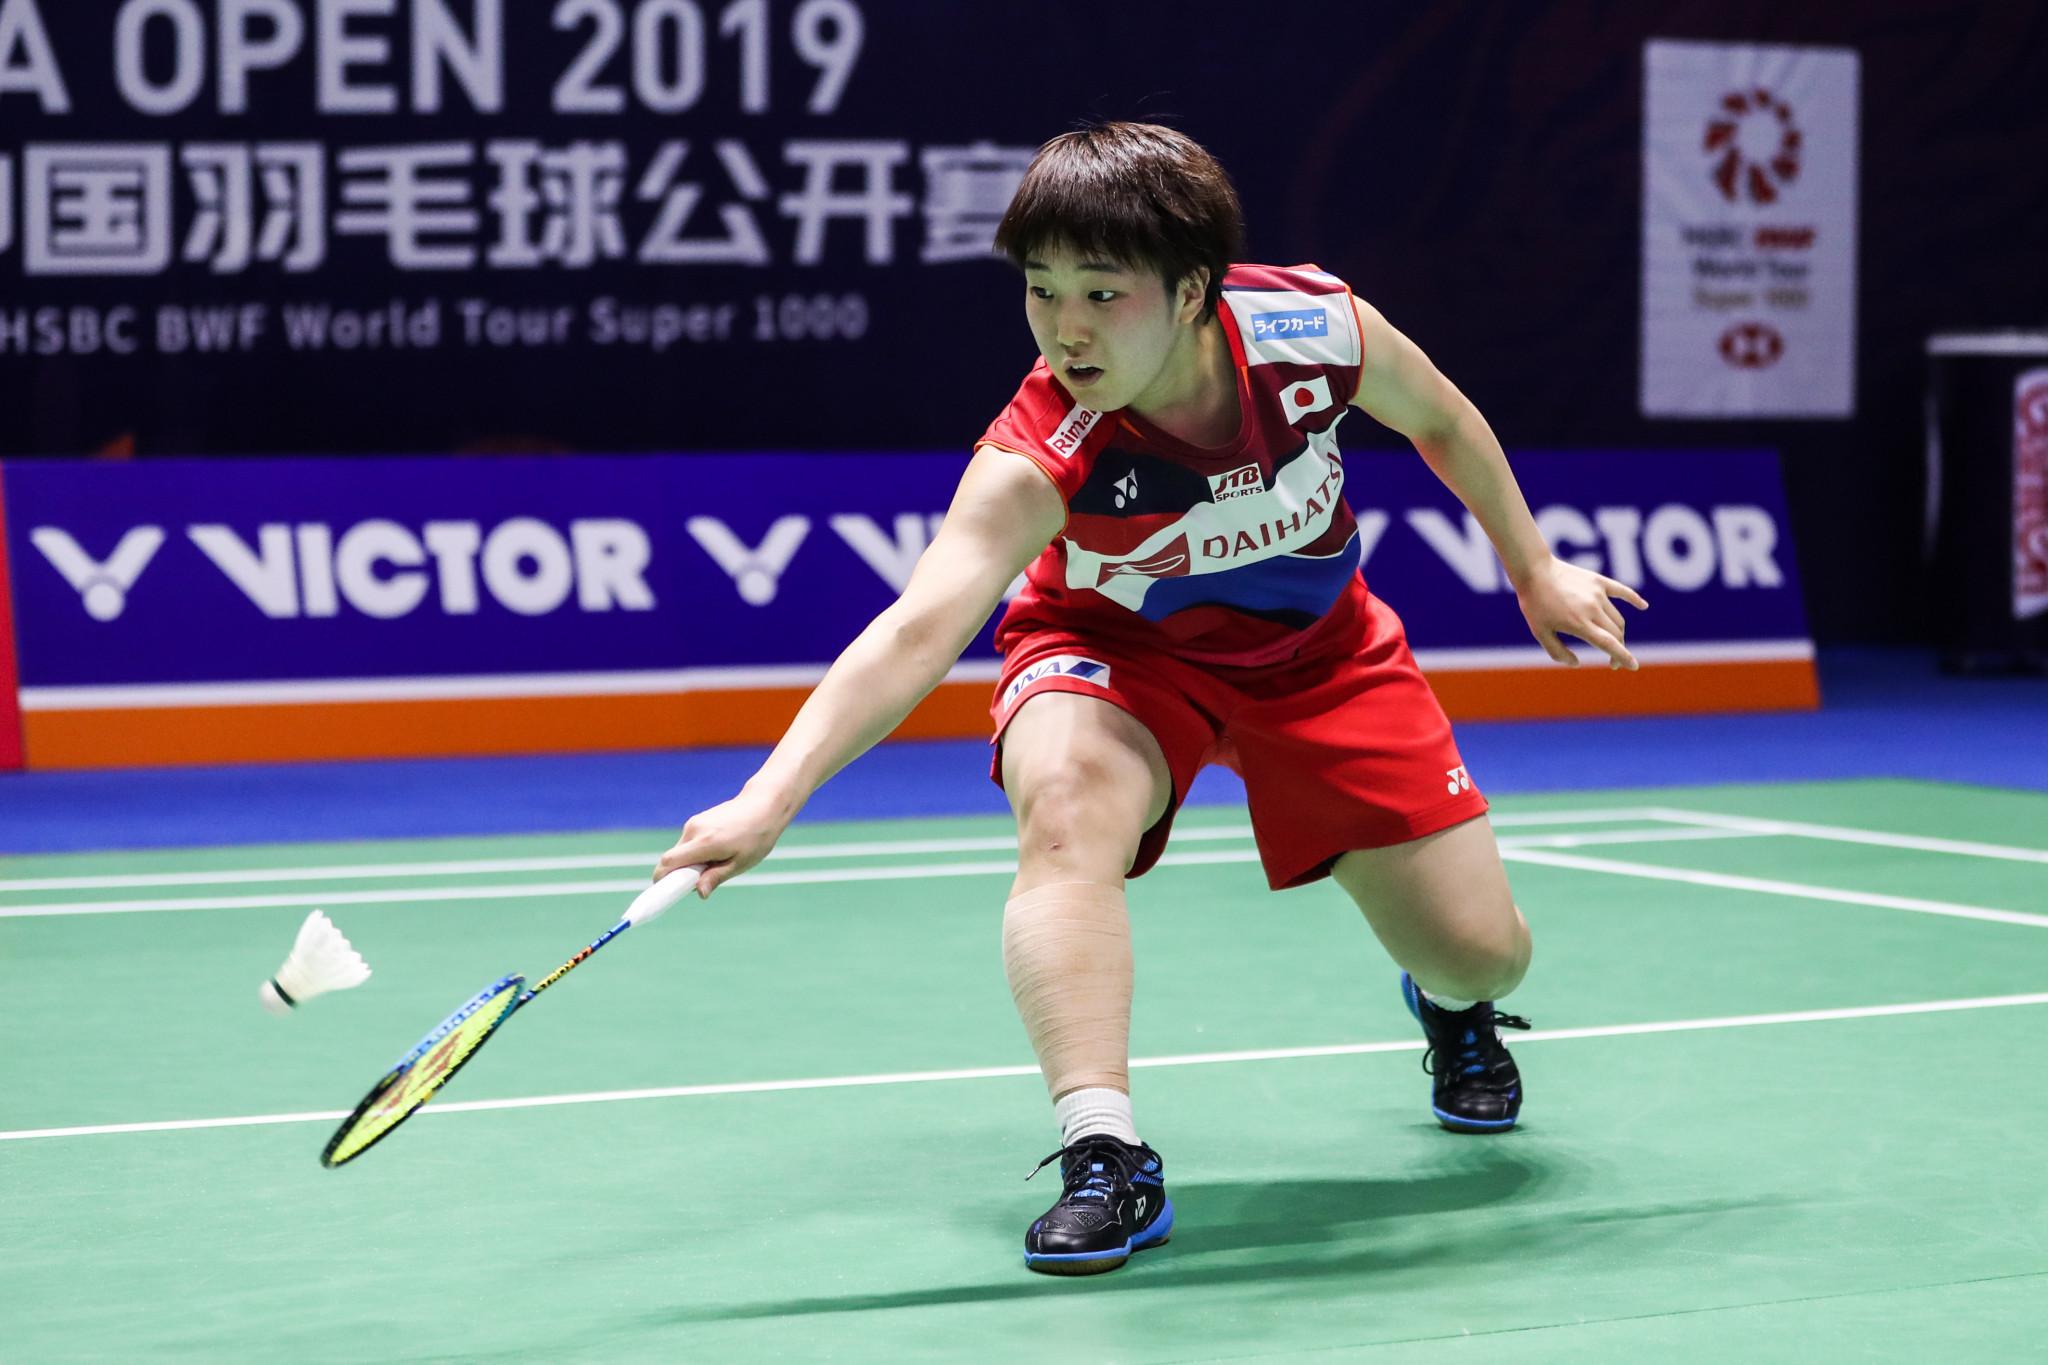 Akane Yamaguchi progressed to the women's singles semi-final ©Getty Images